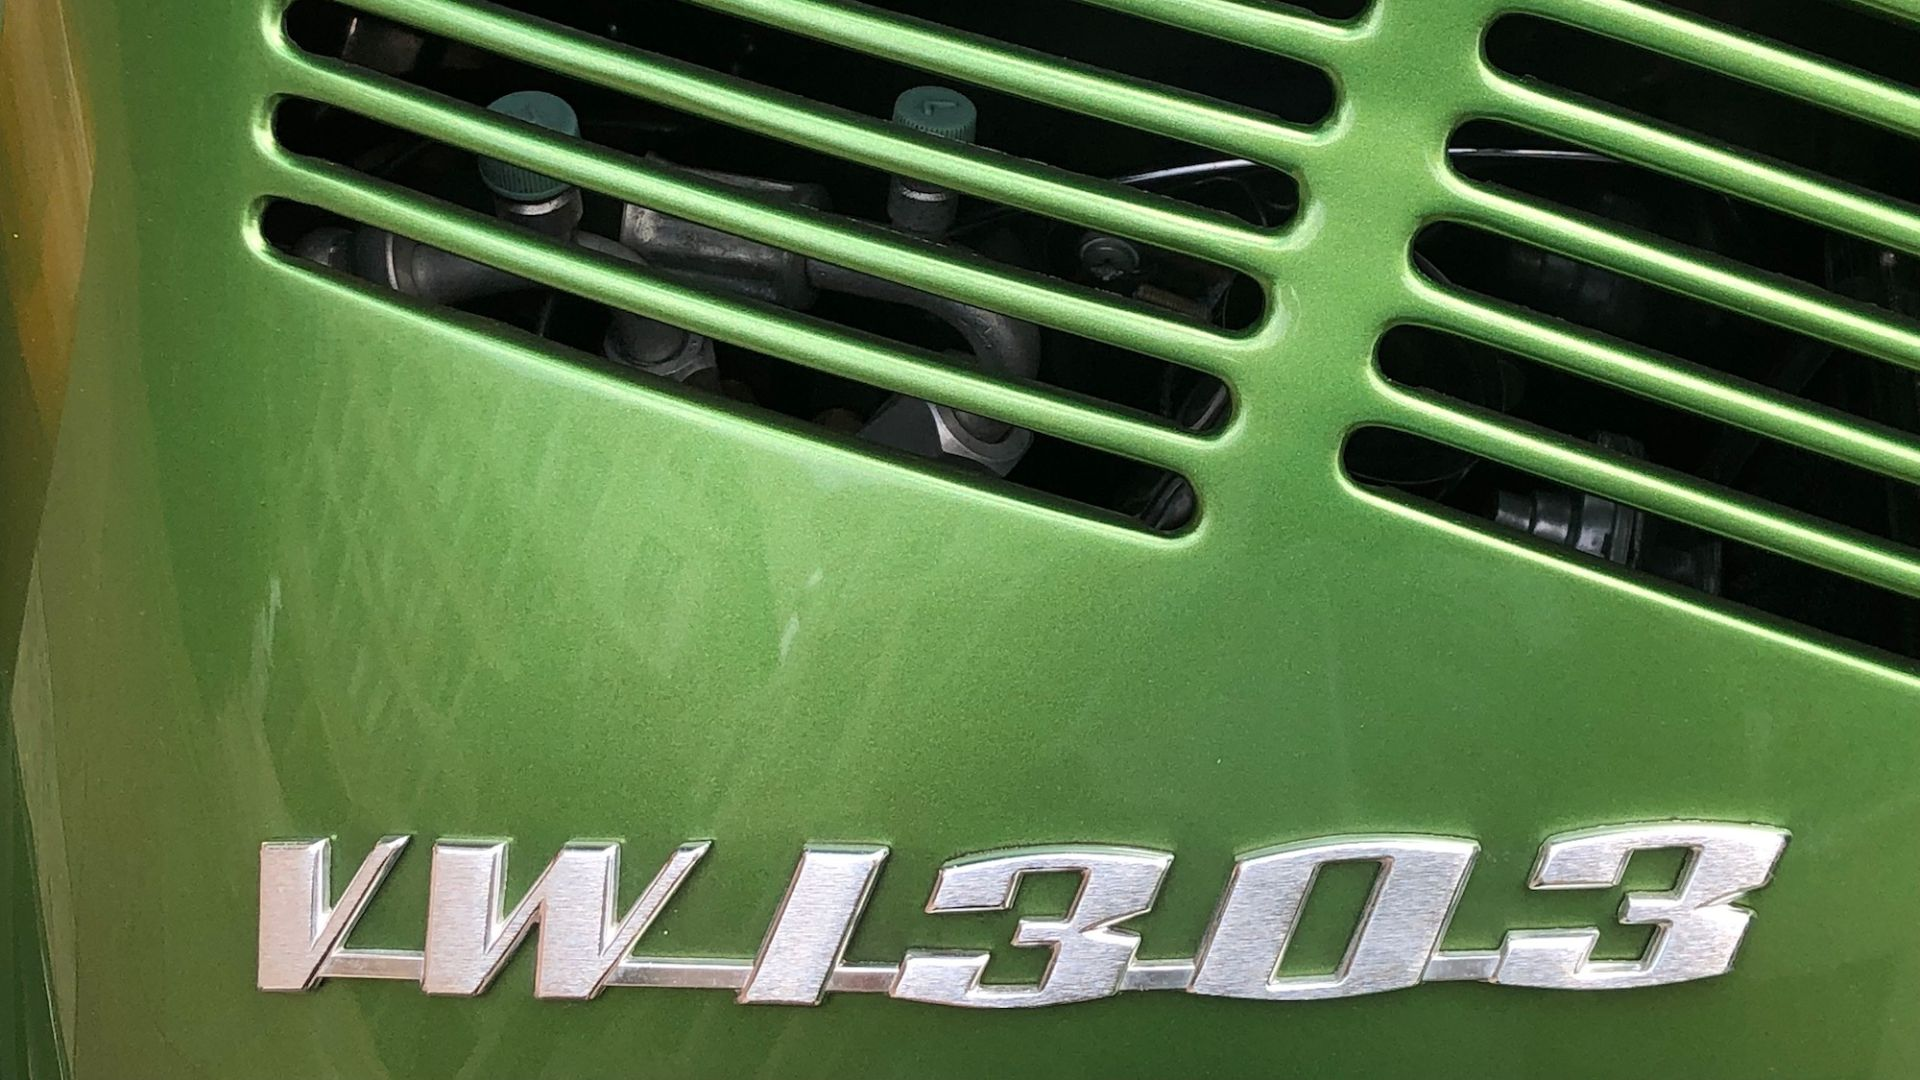 Volkswagen Beetle Roger Daltrey 'The Who'